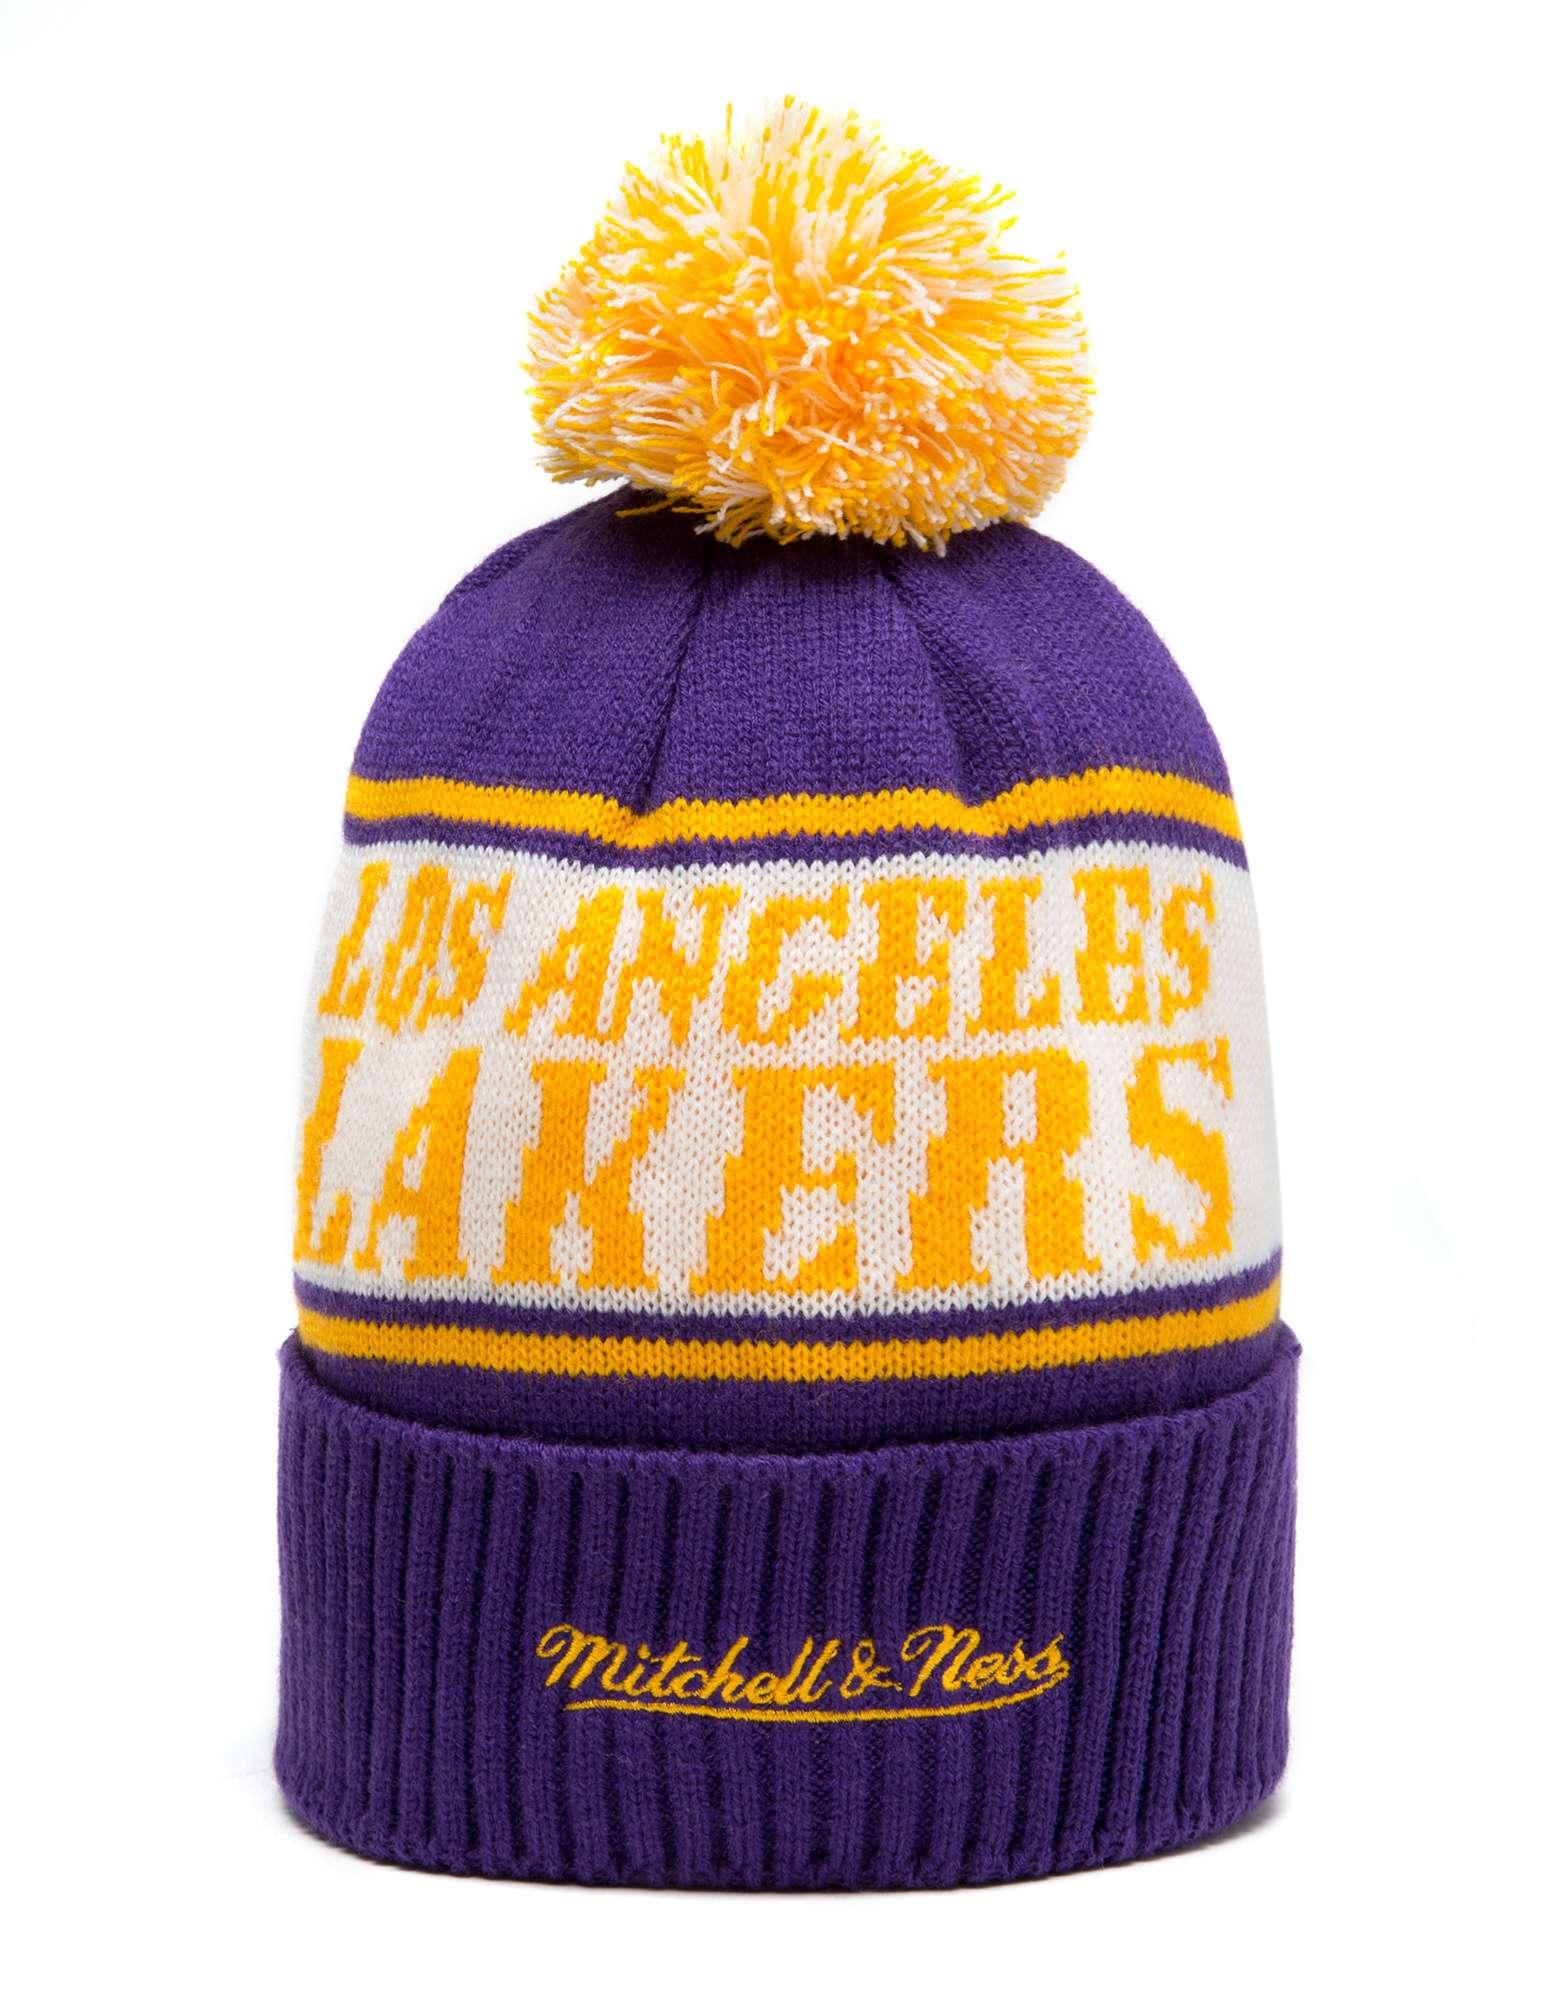 Mitchell & Ness NBA Los Angeles Lakers Wordmark Bobble Hat